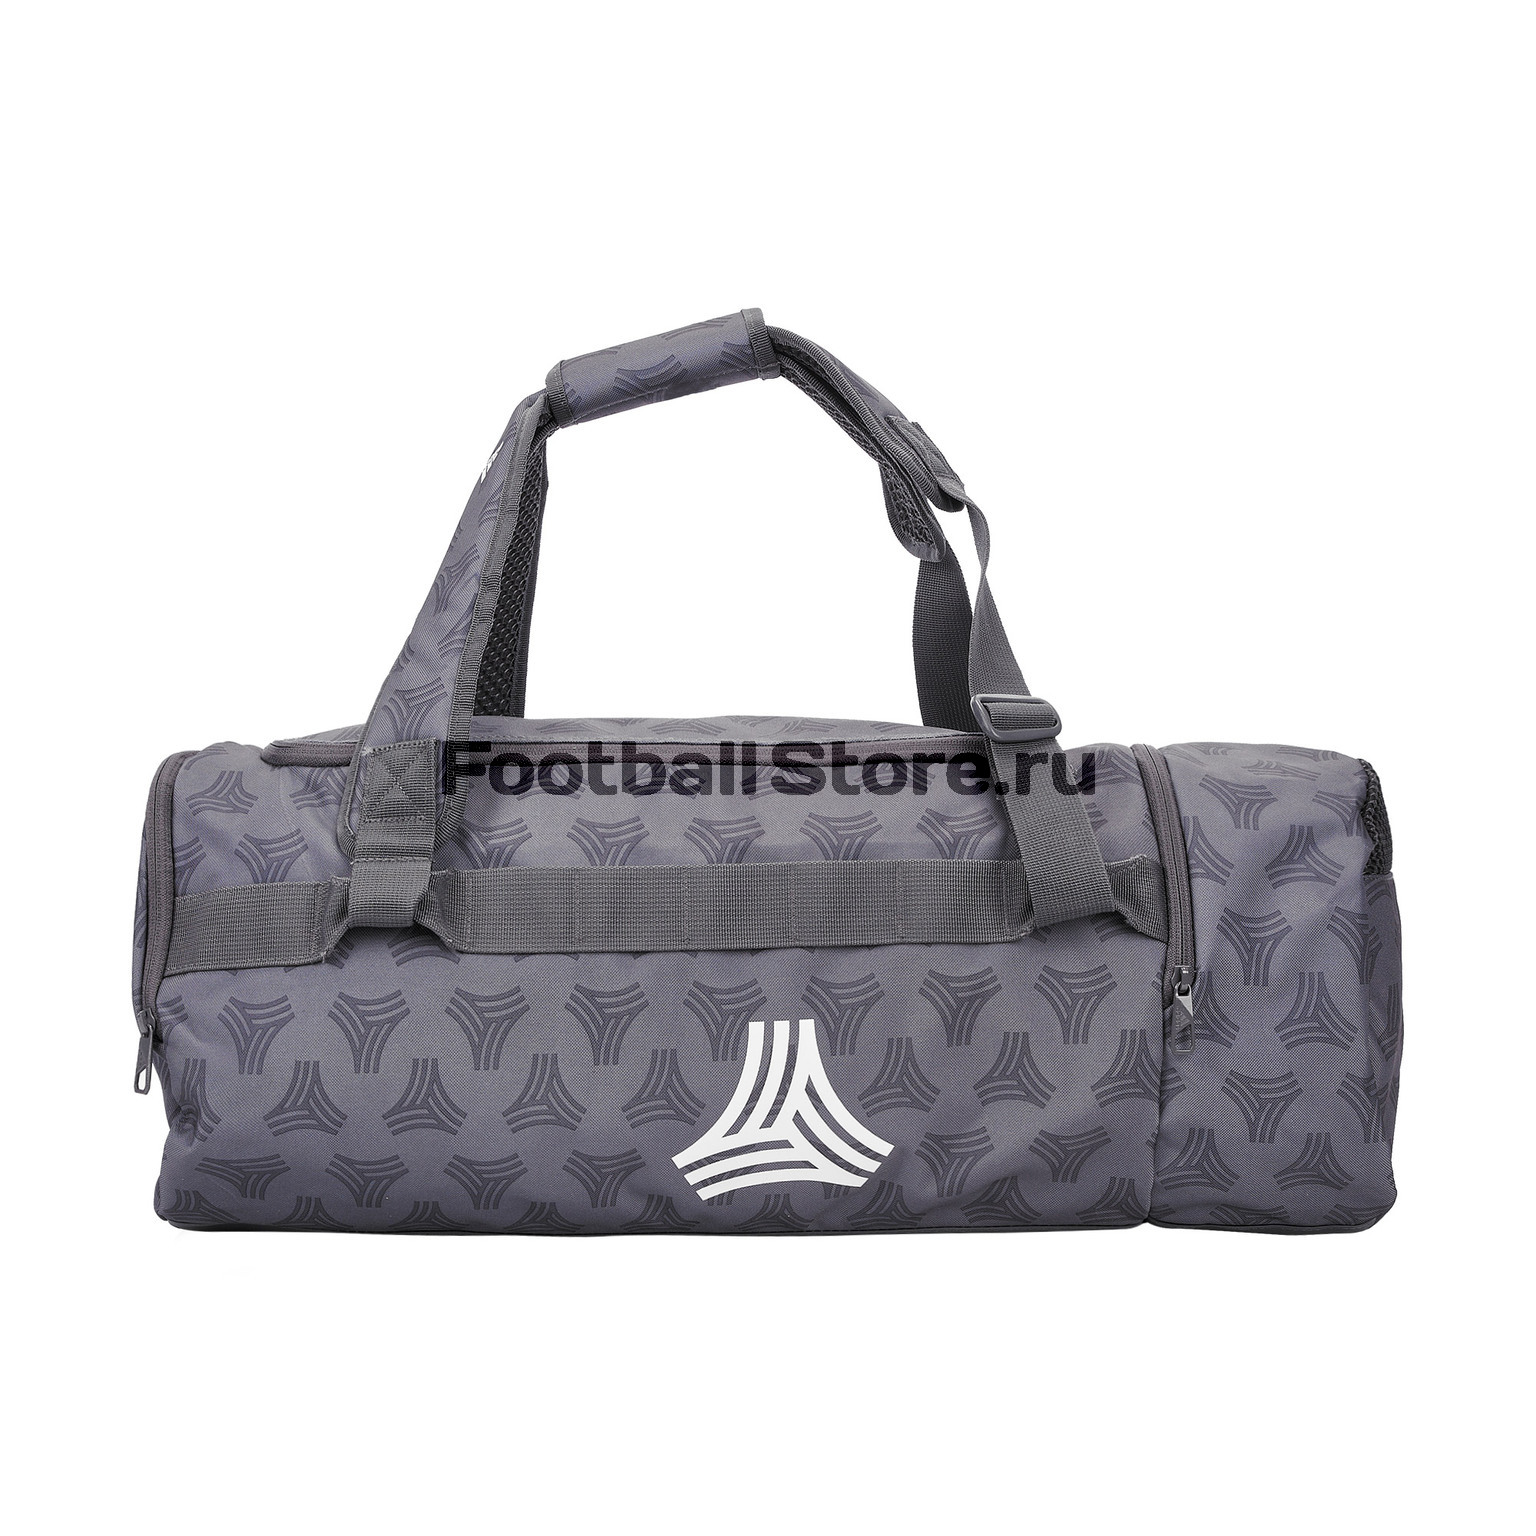 Сумка Adidas Football Street DT5140 рюкзак adidas football street dt5142